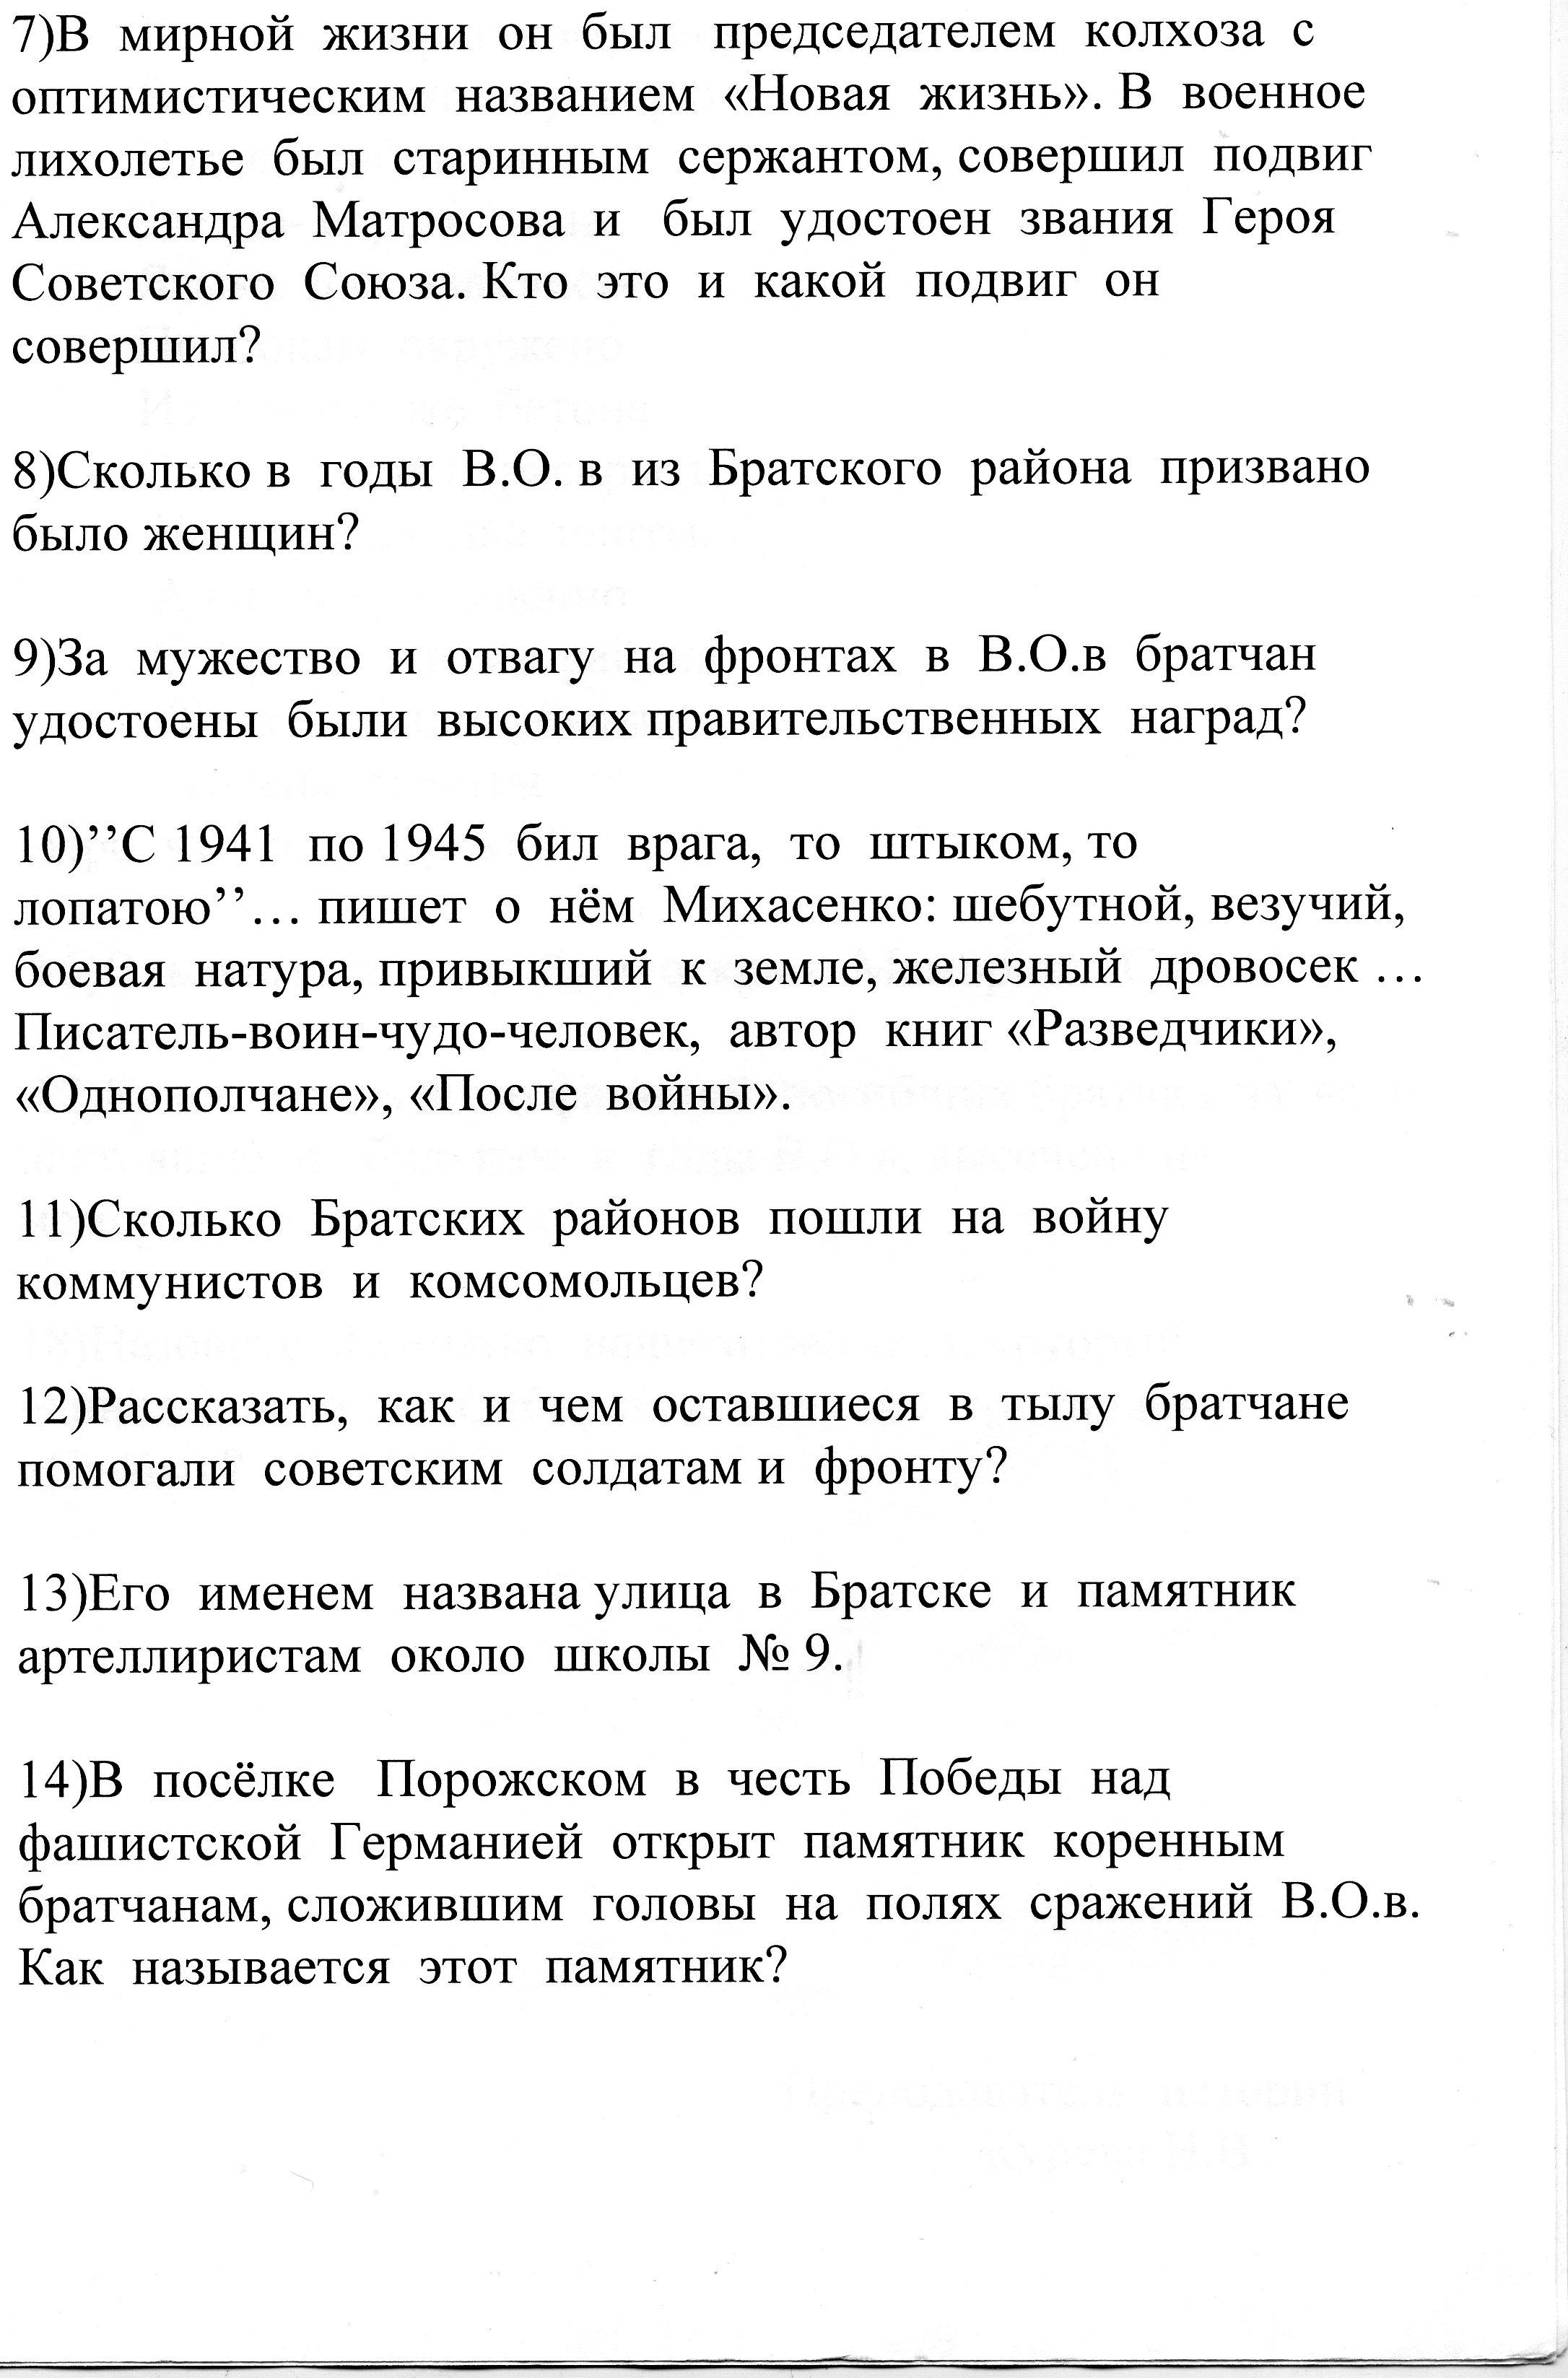 C:\Users\Ульяна\Pictures\скан473.jpg